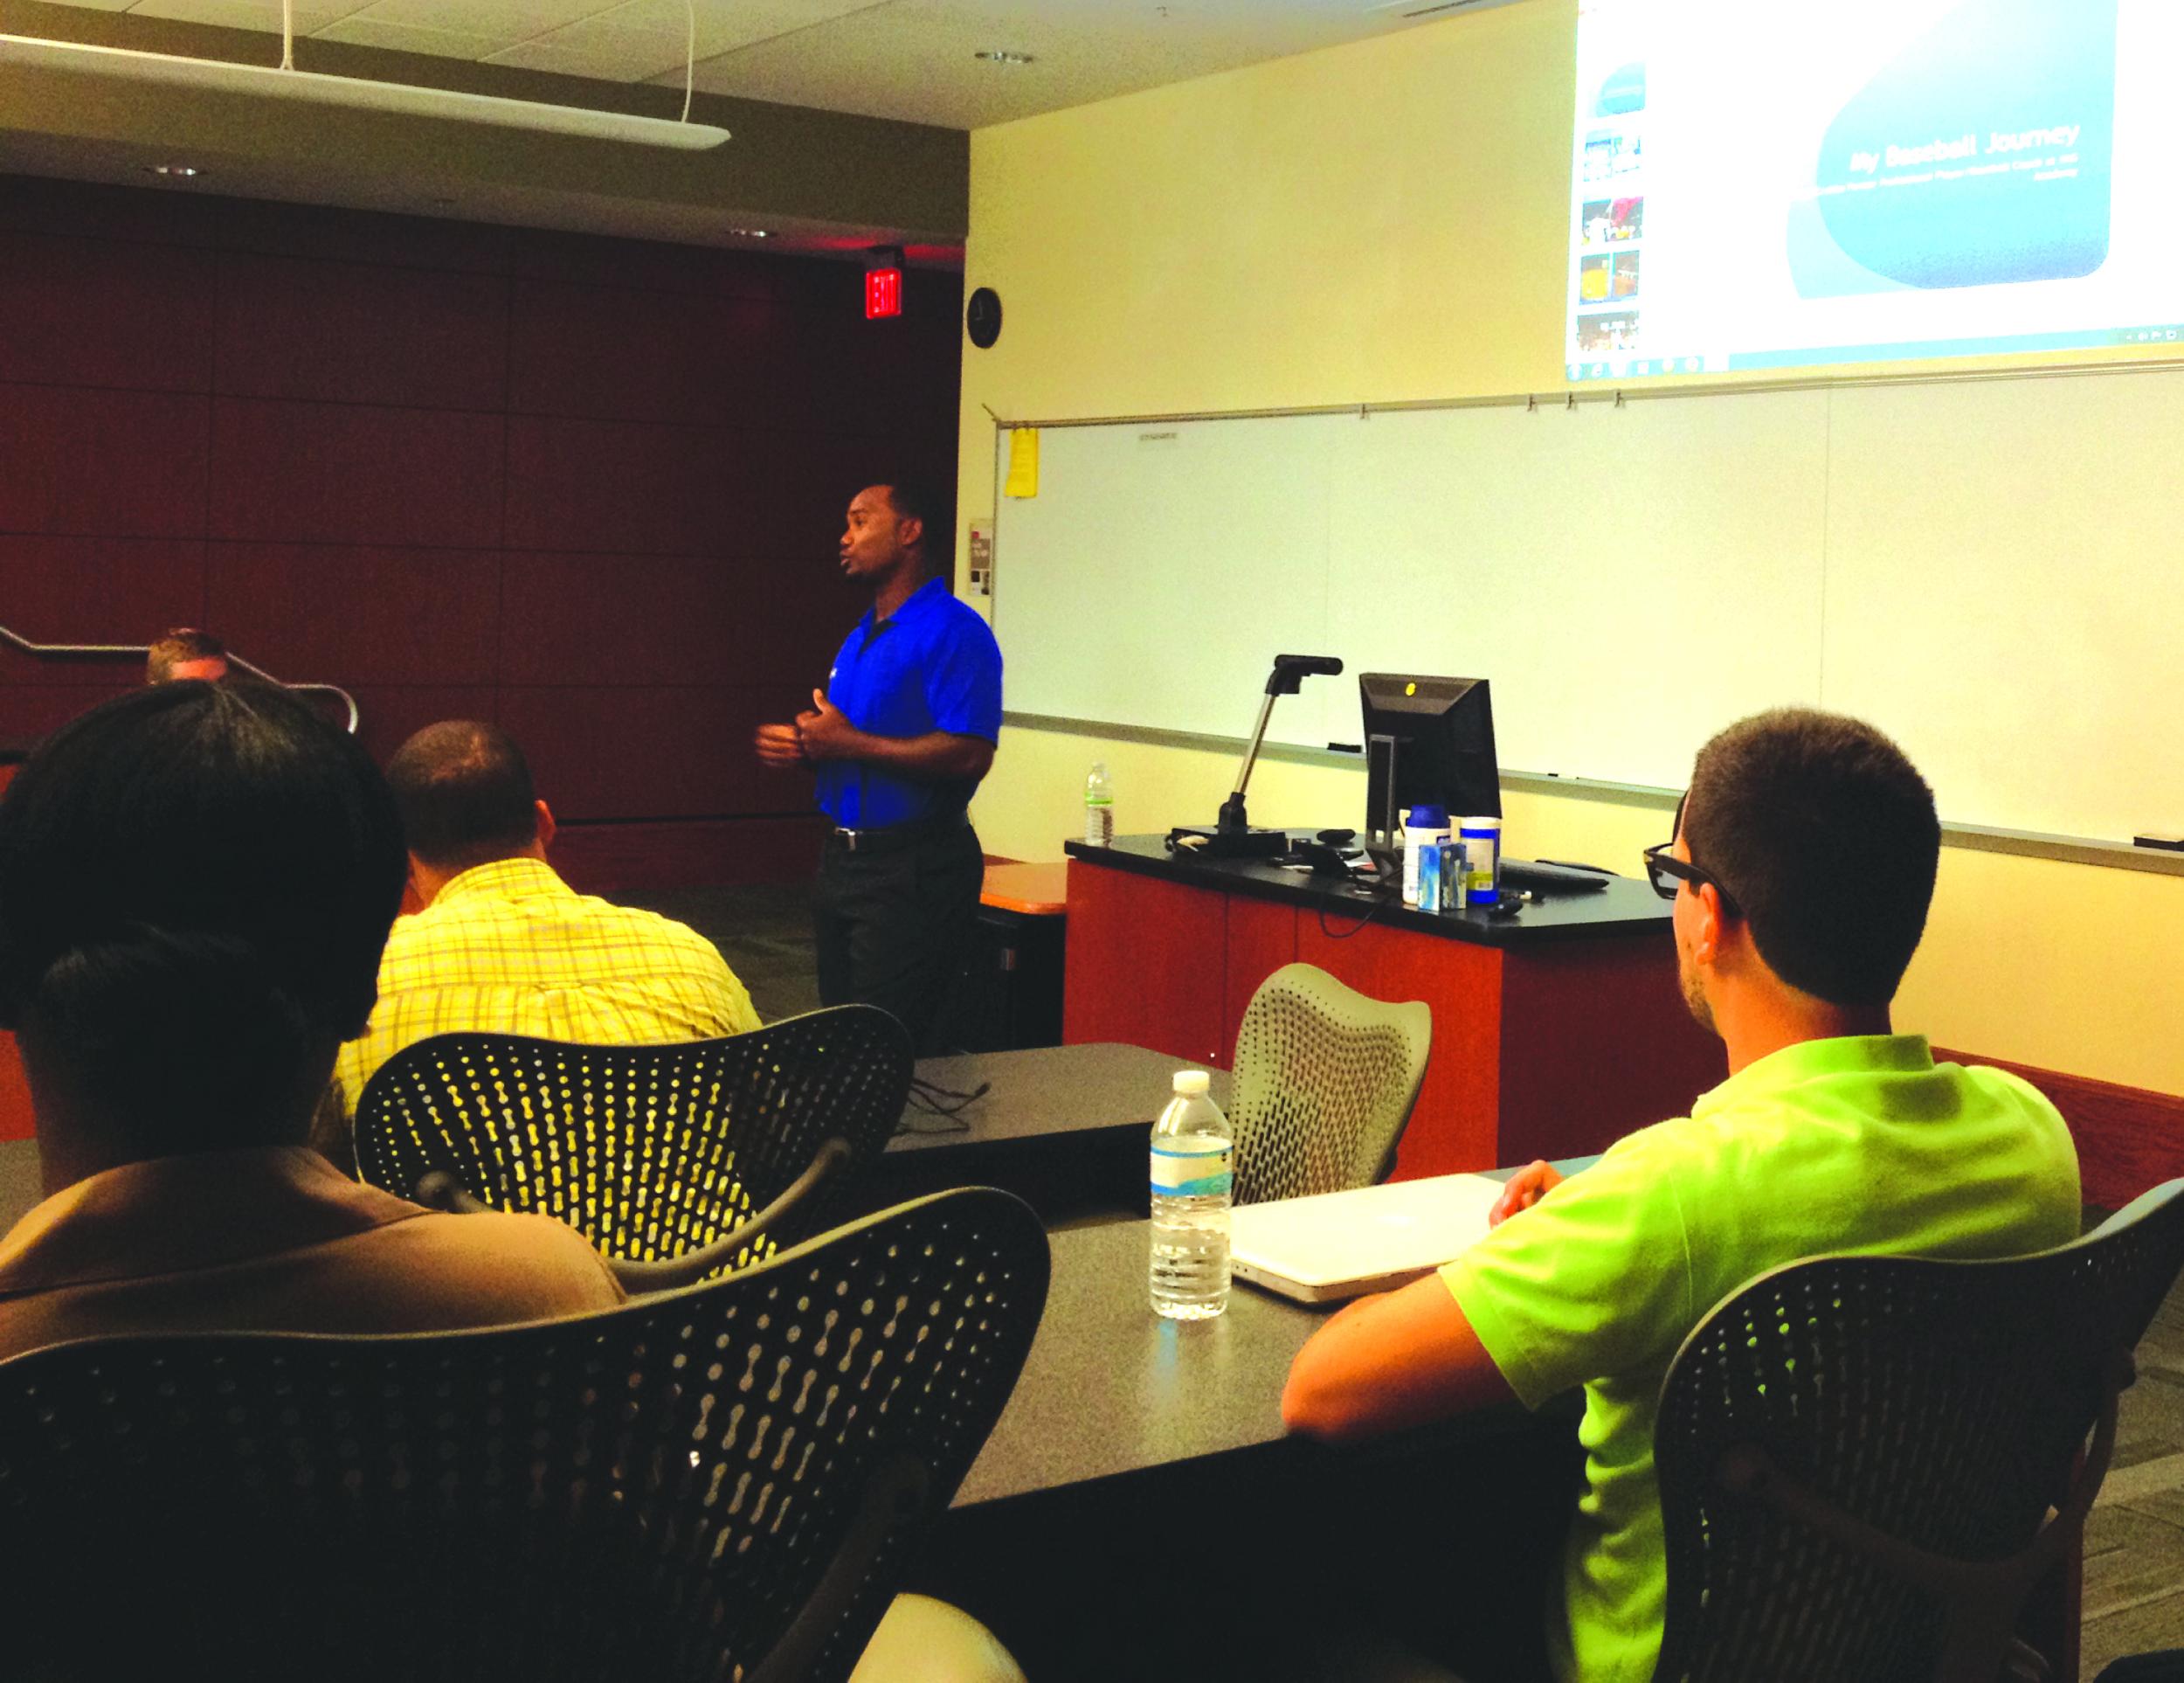 Callix Crabbe teaches personal development